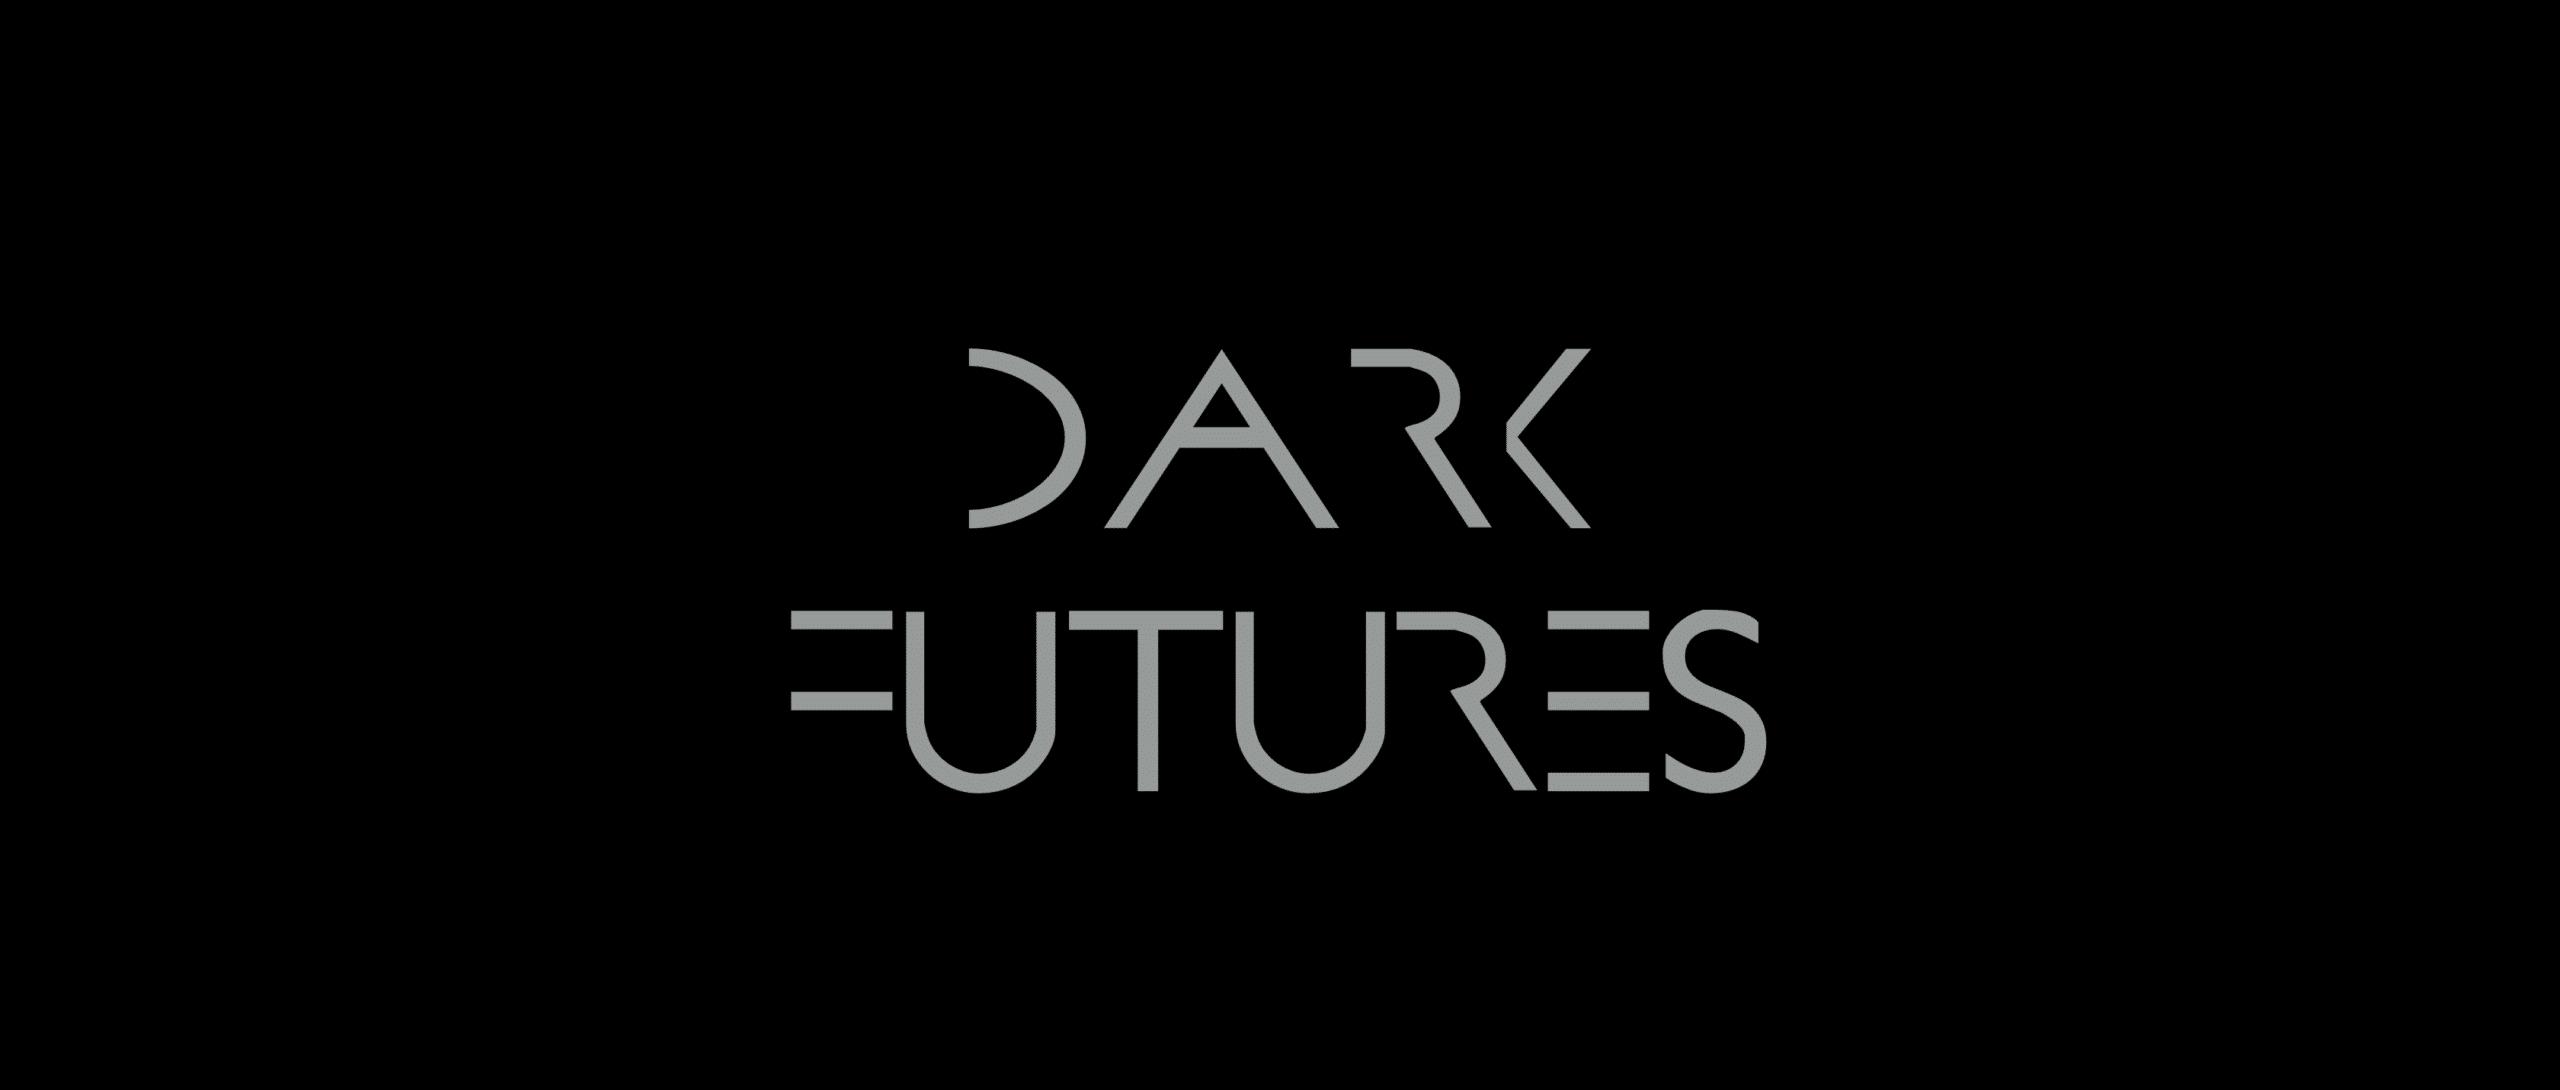 DARK FUTURES: Event on November 24th, 2015